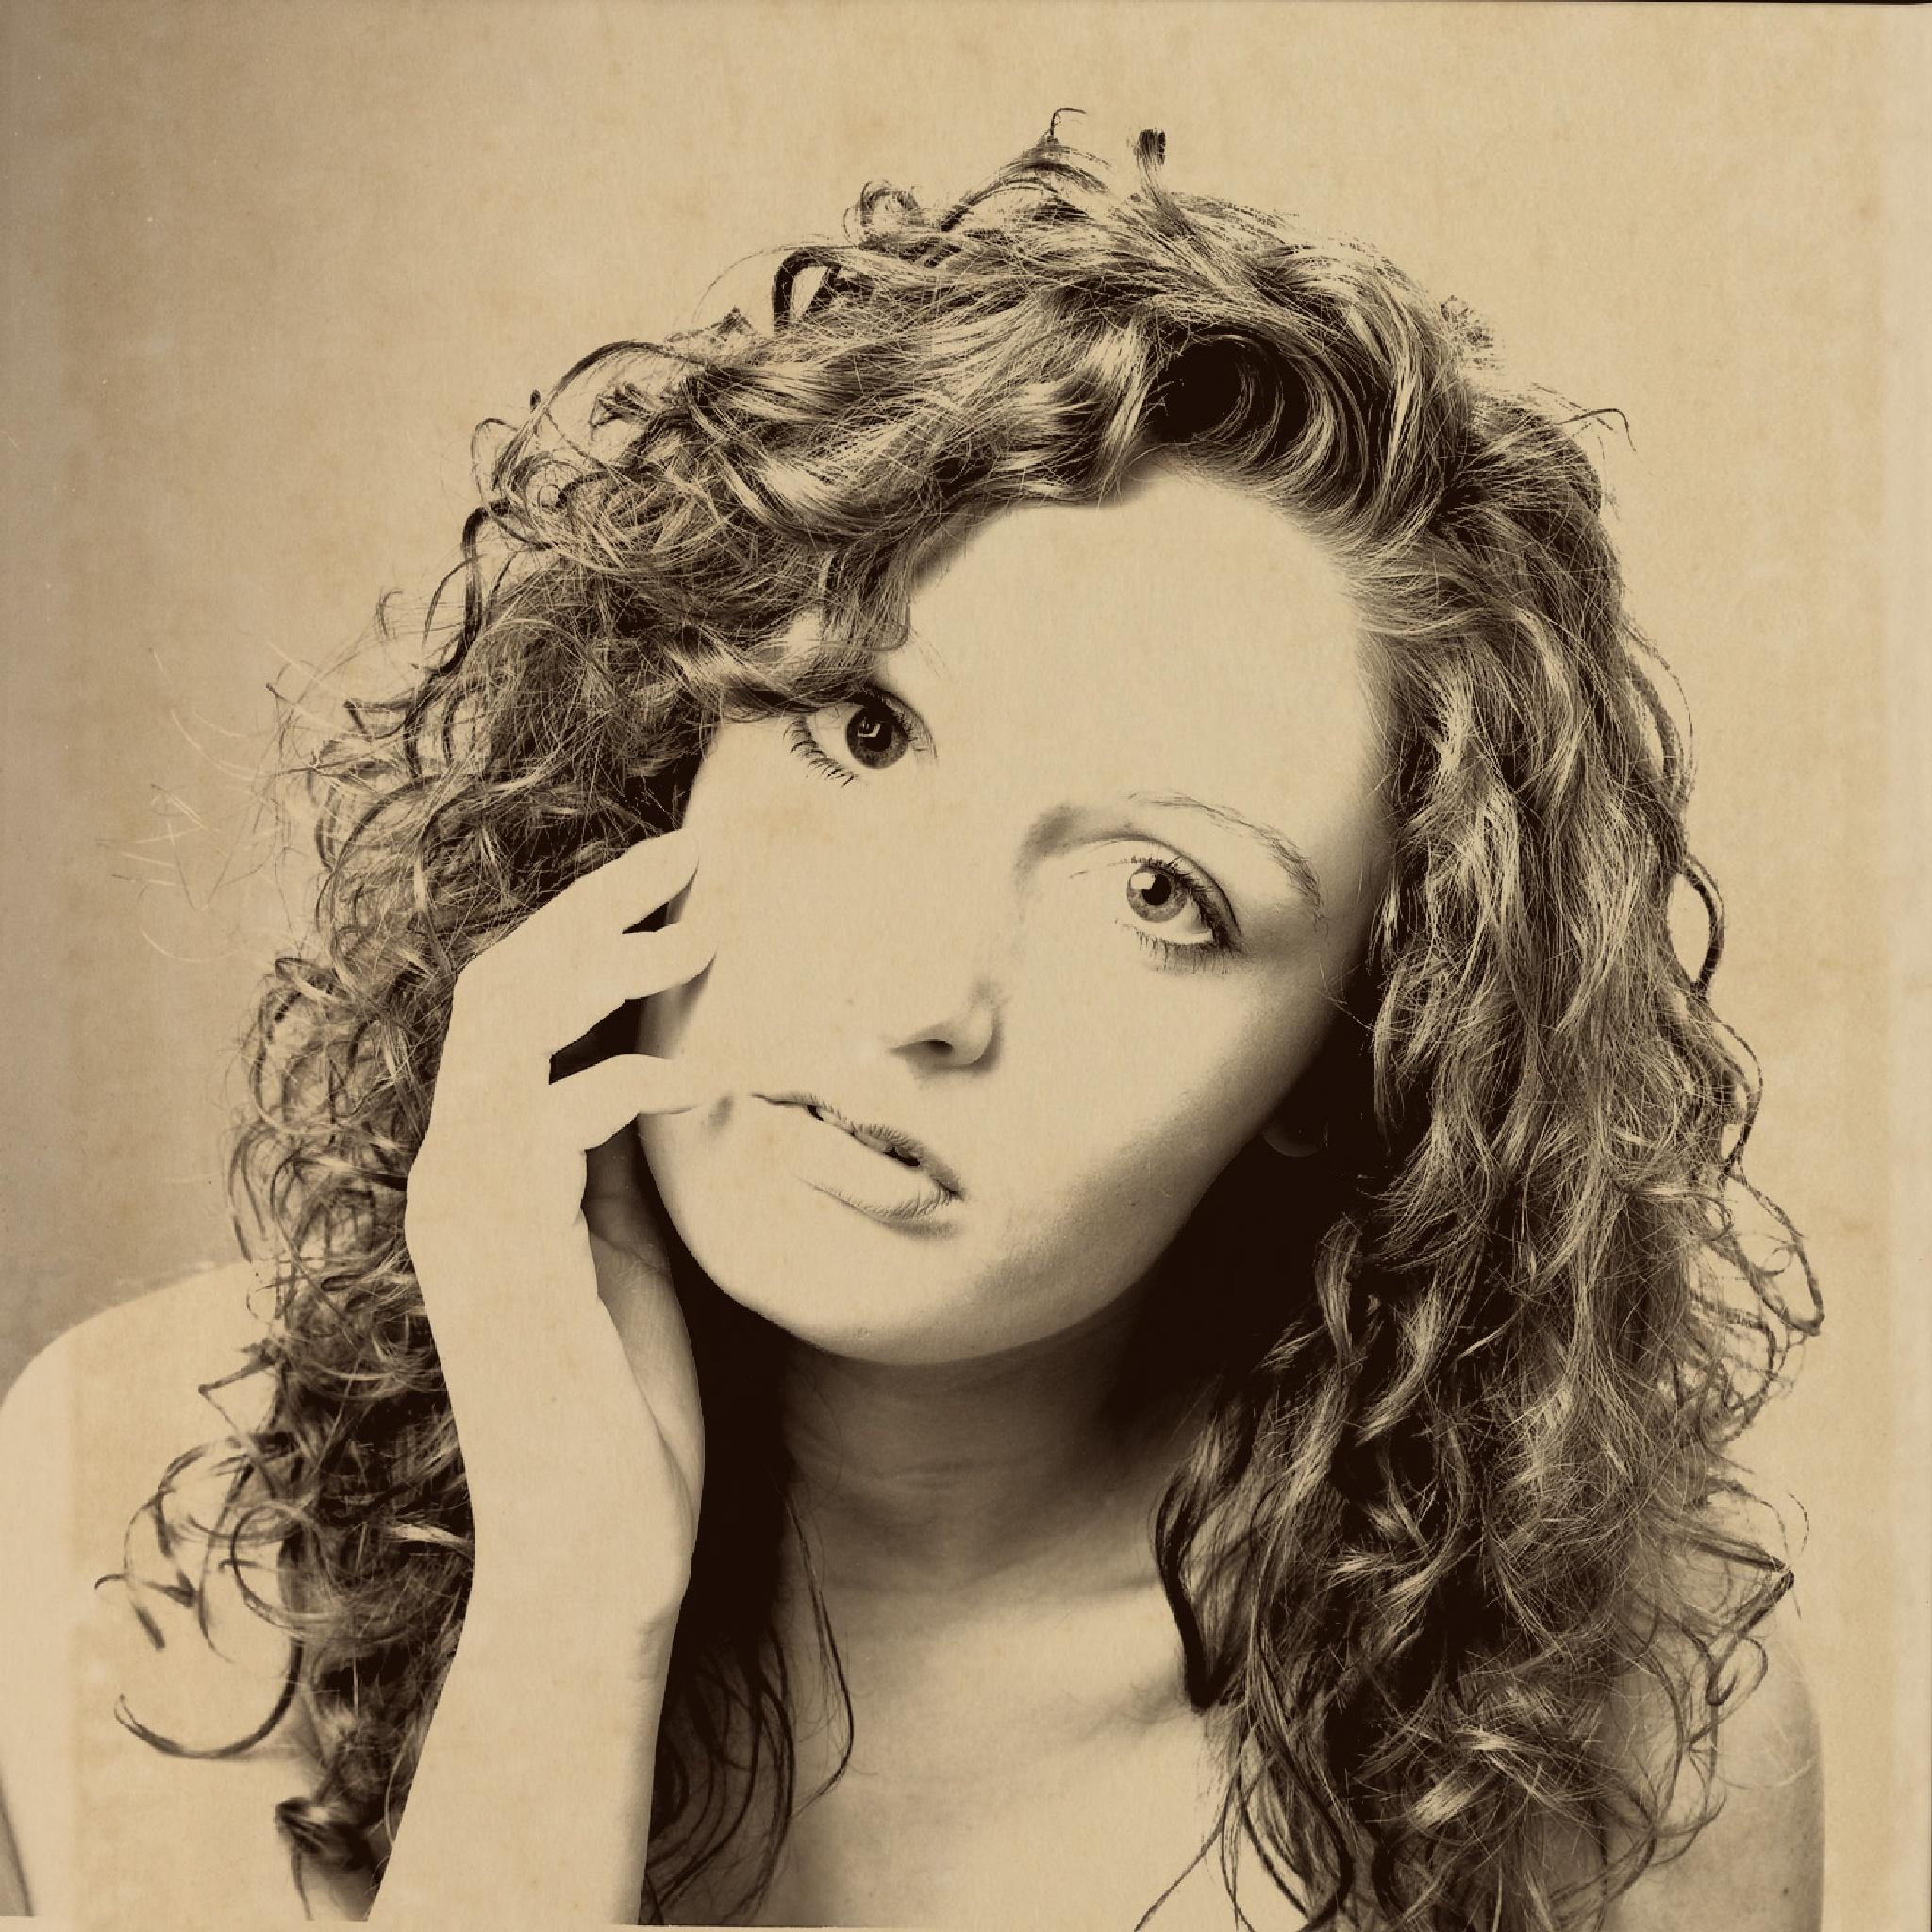 Female portrait, High Key by Pixforce